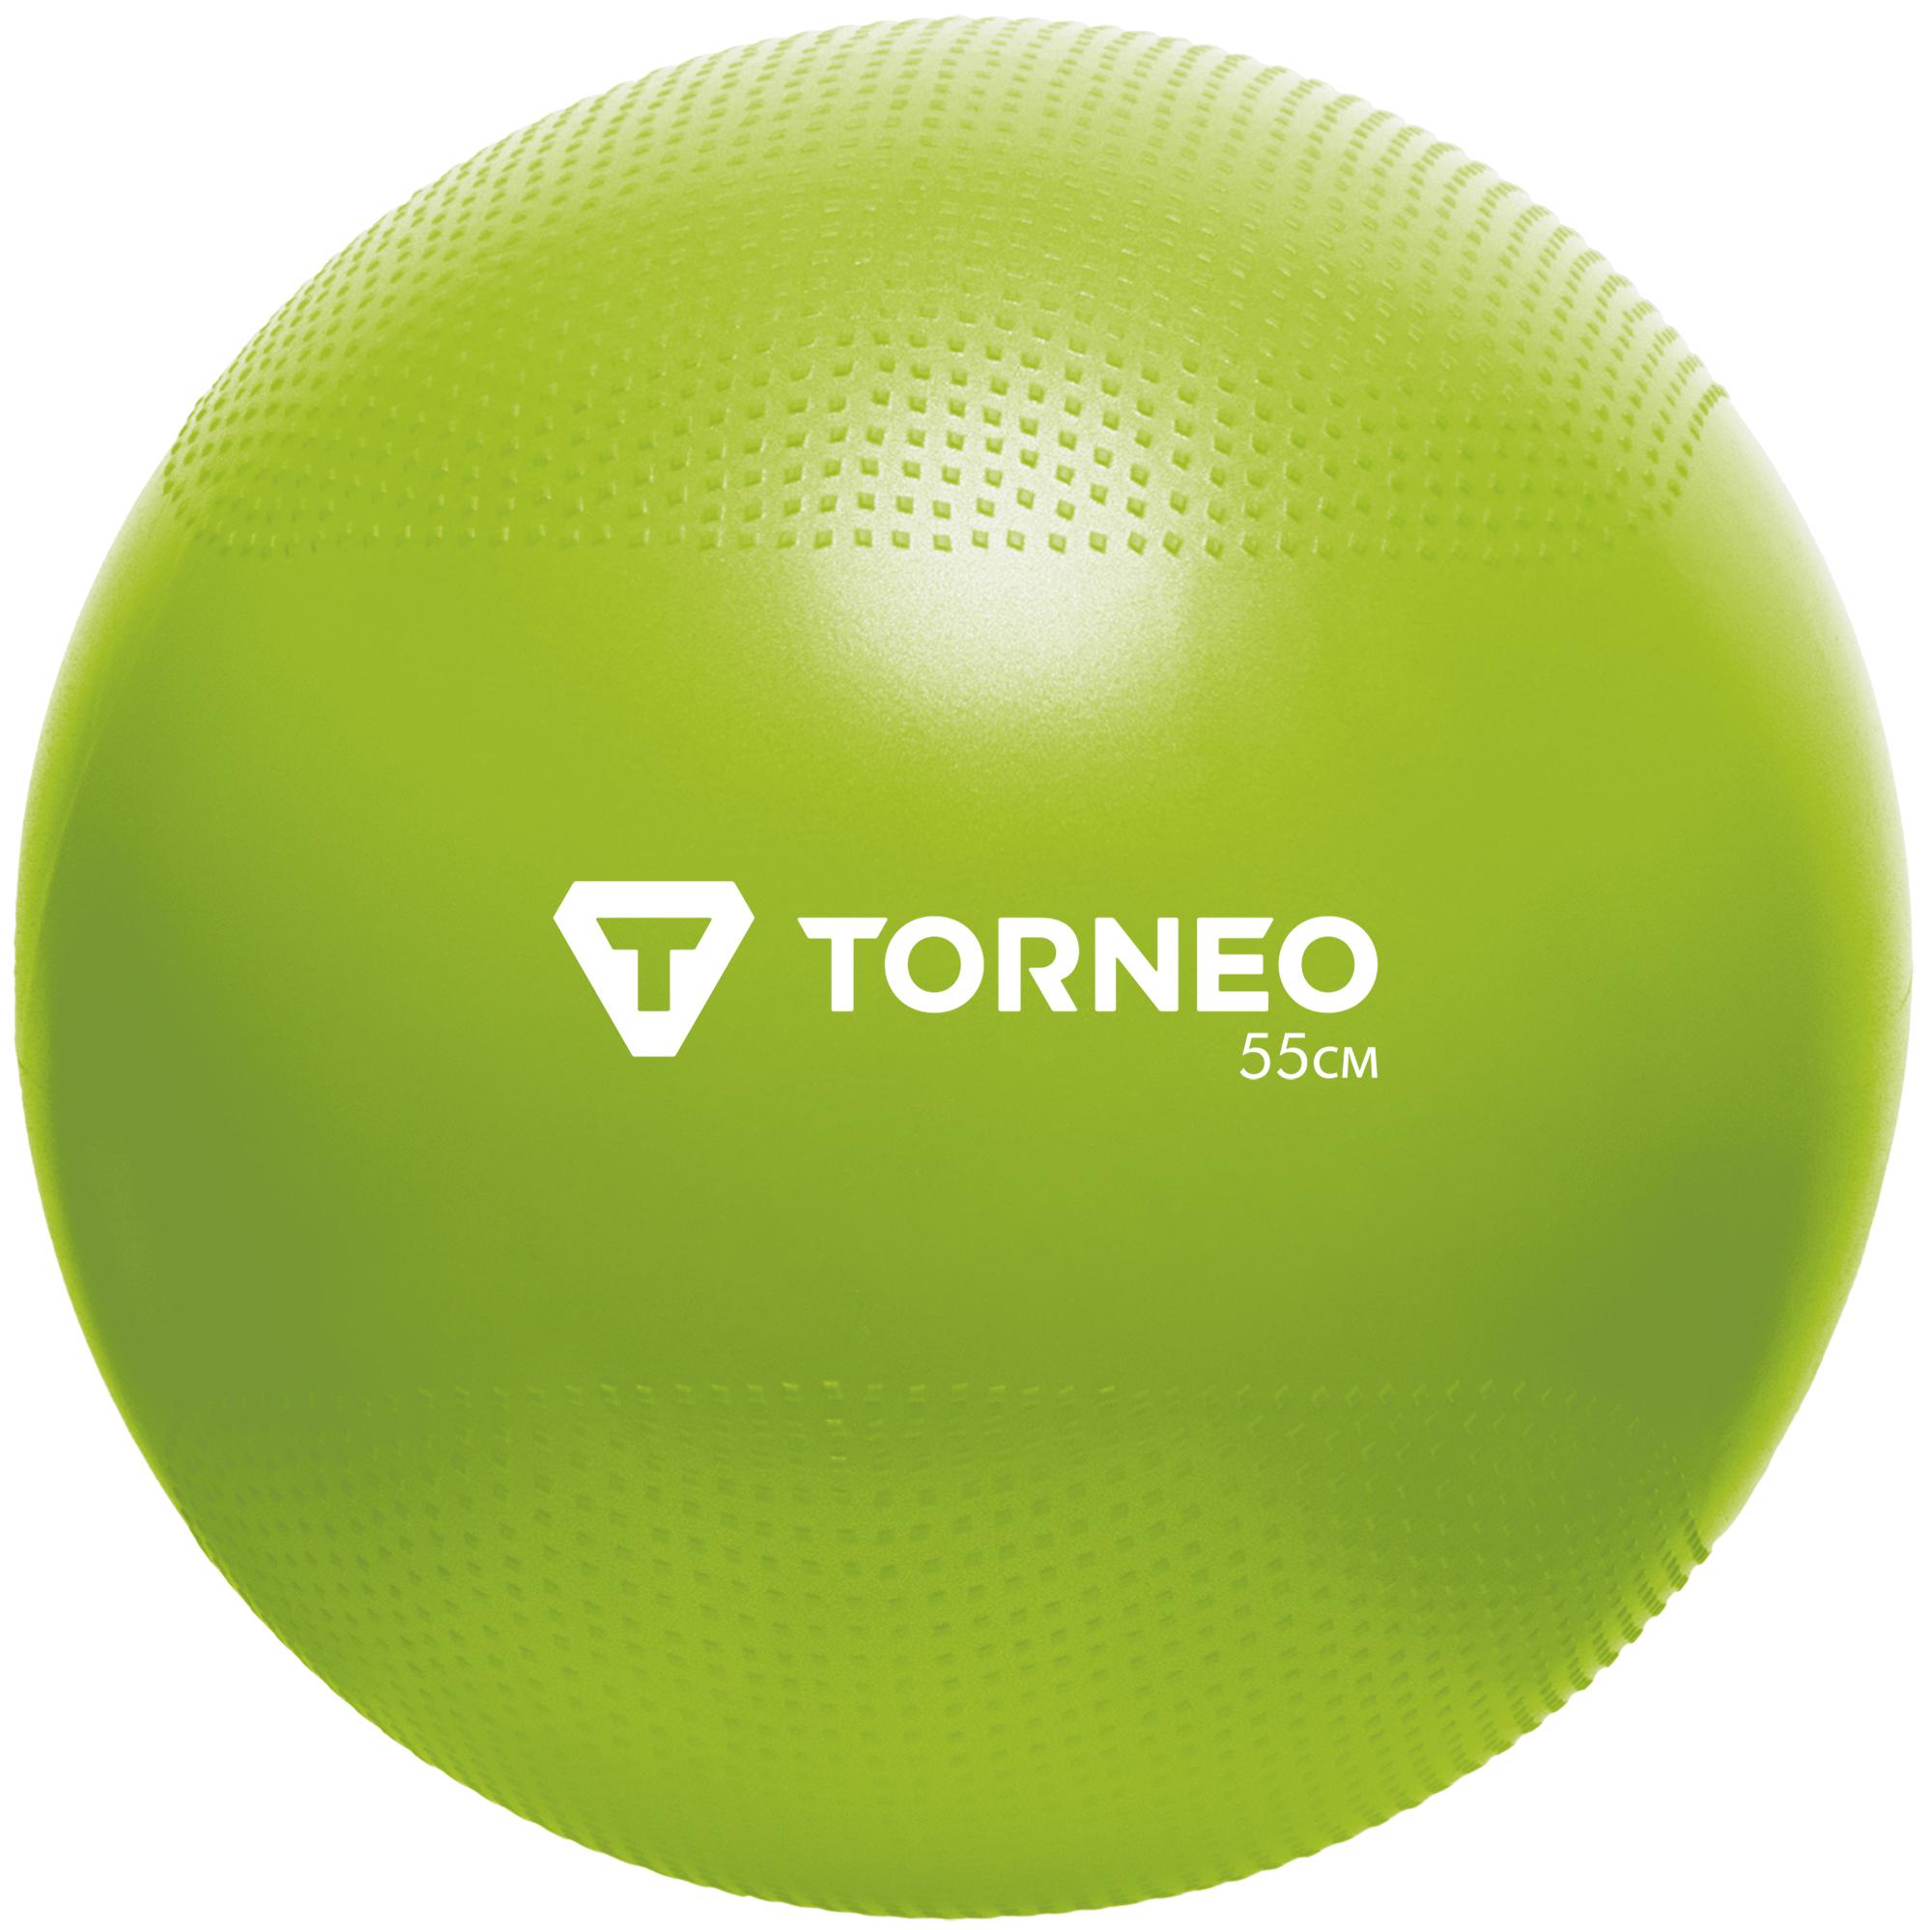 Torneo Мяч гимнастический Torneo, 55 см